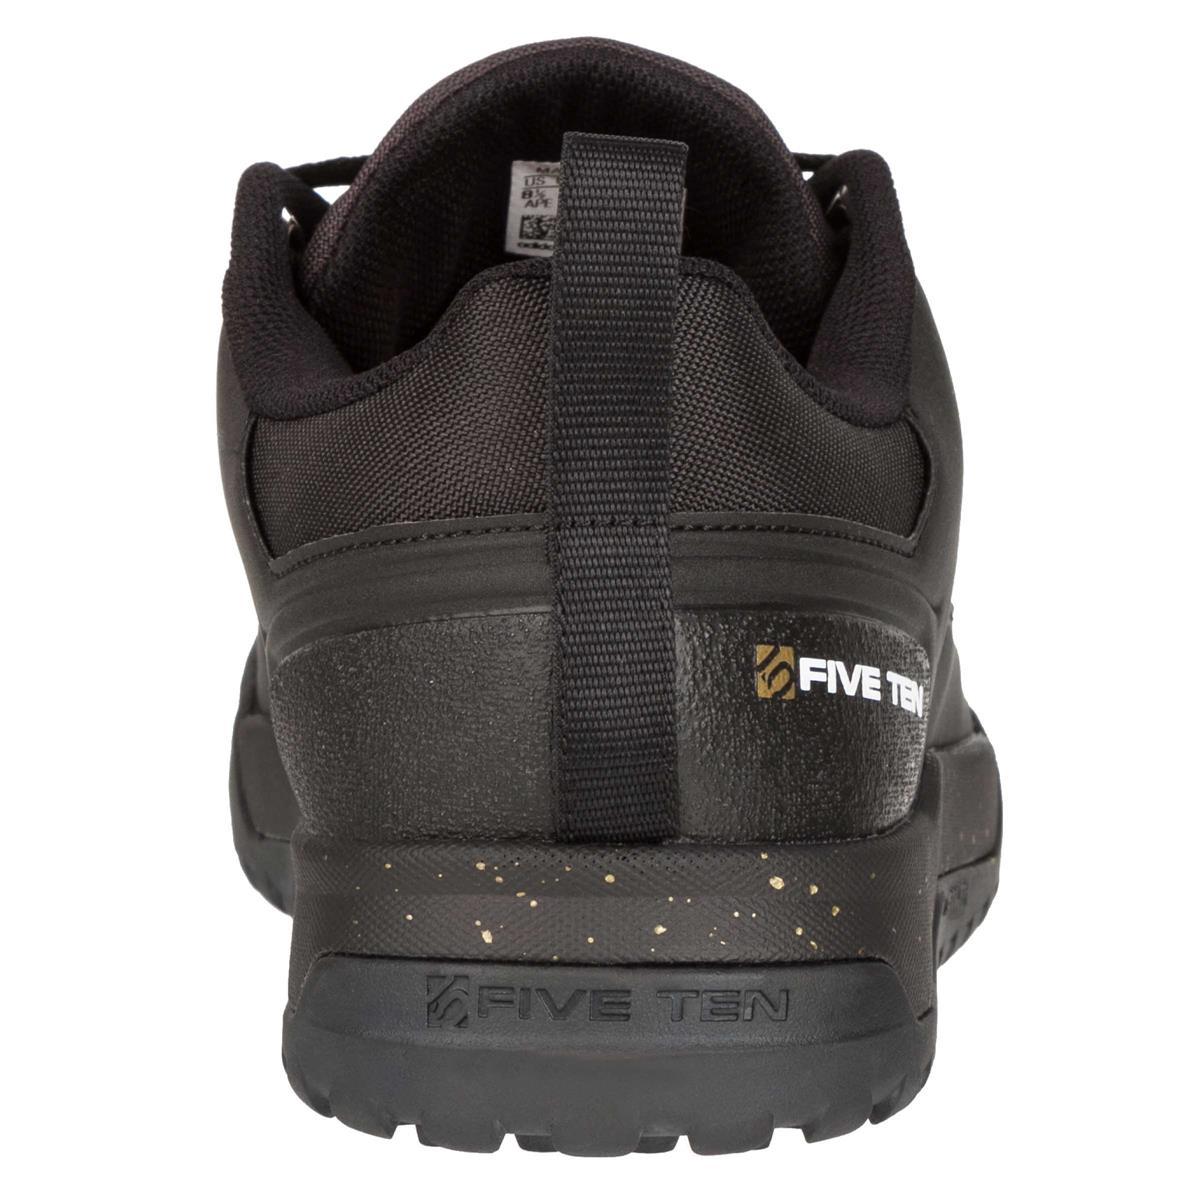 Five Ten Mtb Chaussures Impact Pro Core Black//Core Black//Gold Met.